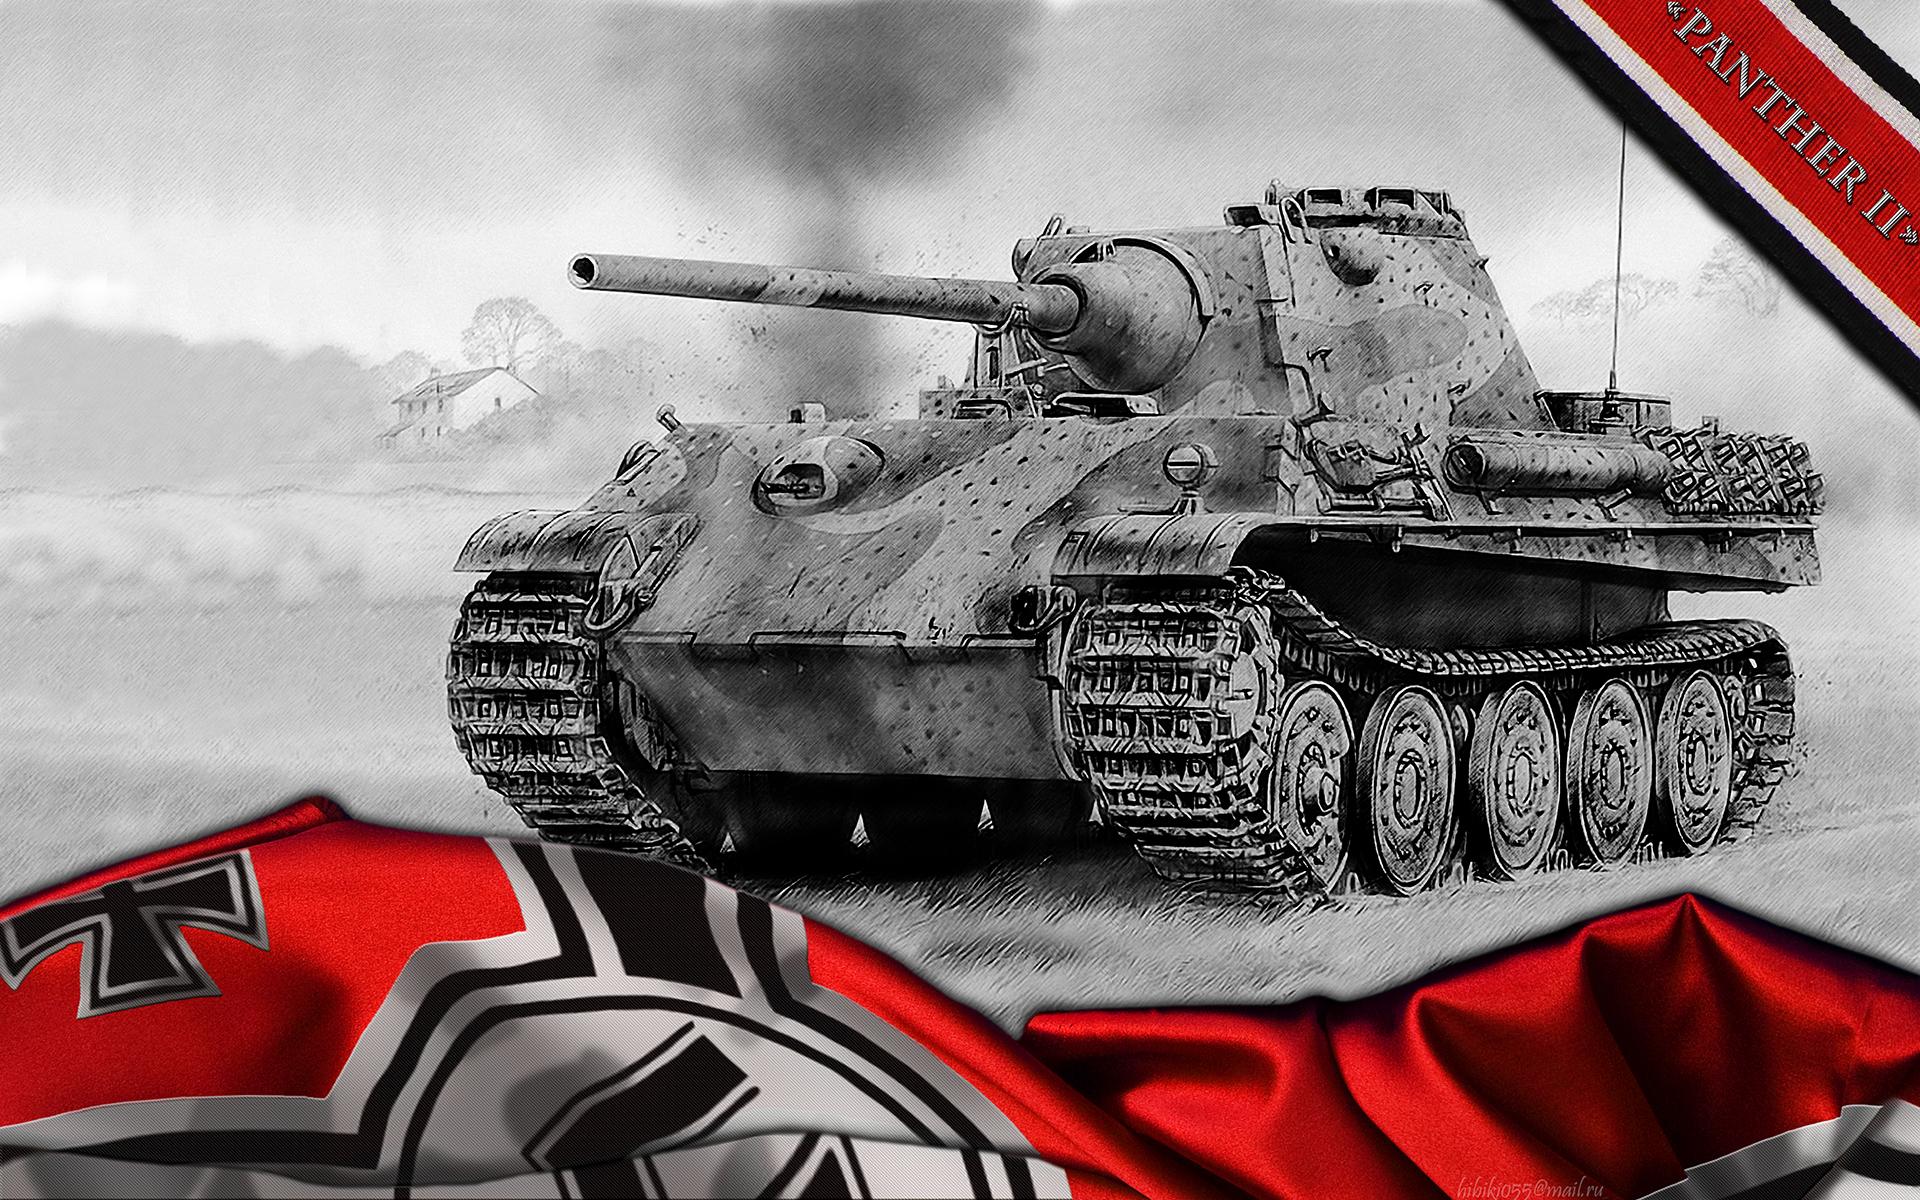 panther tank wallpaper hd - photo #6